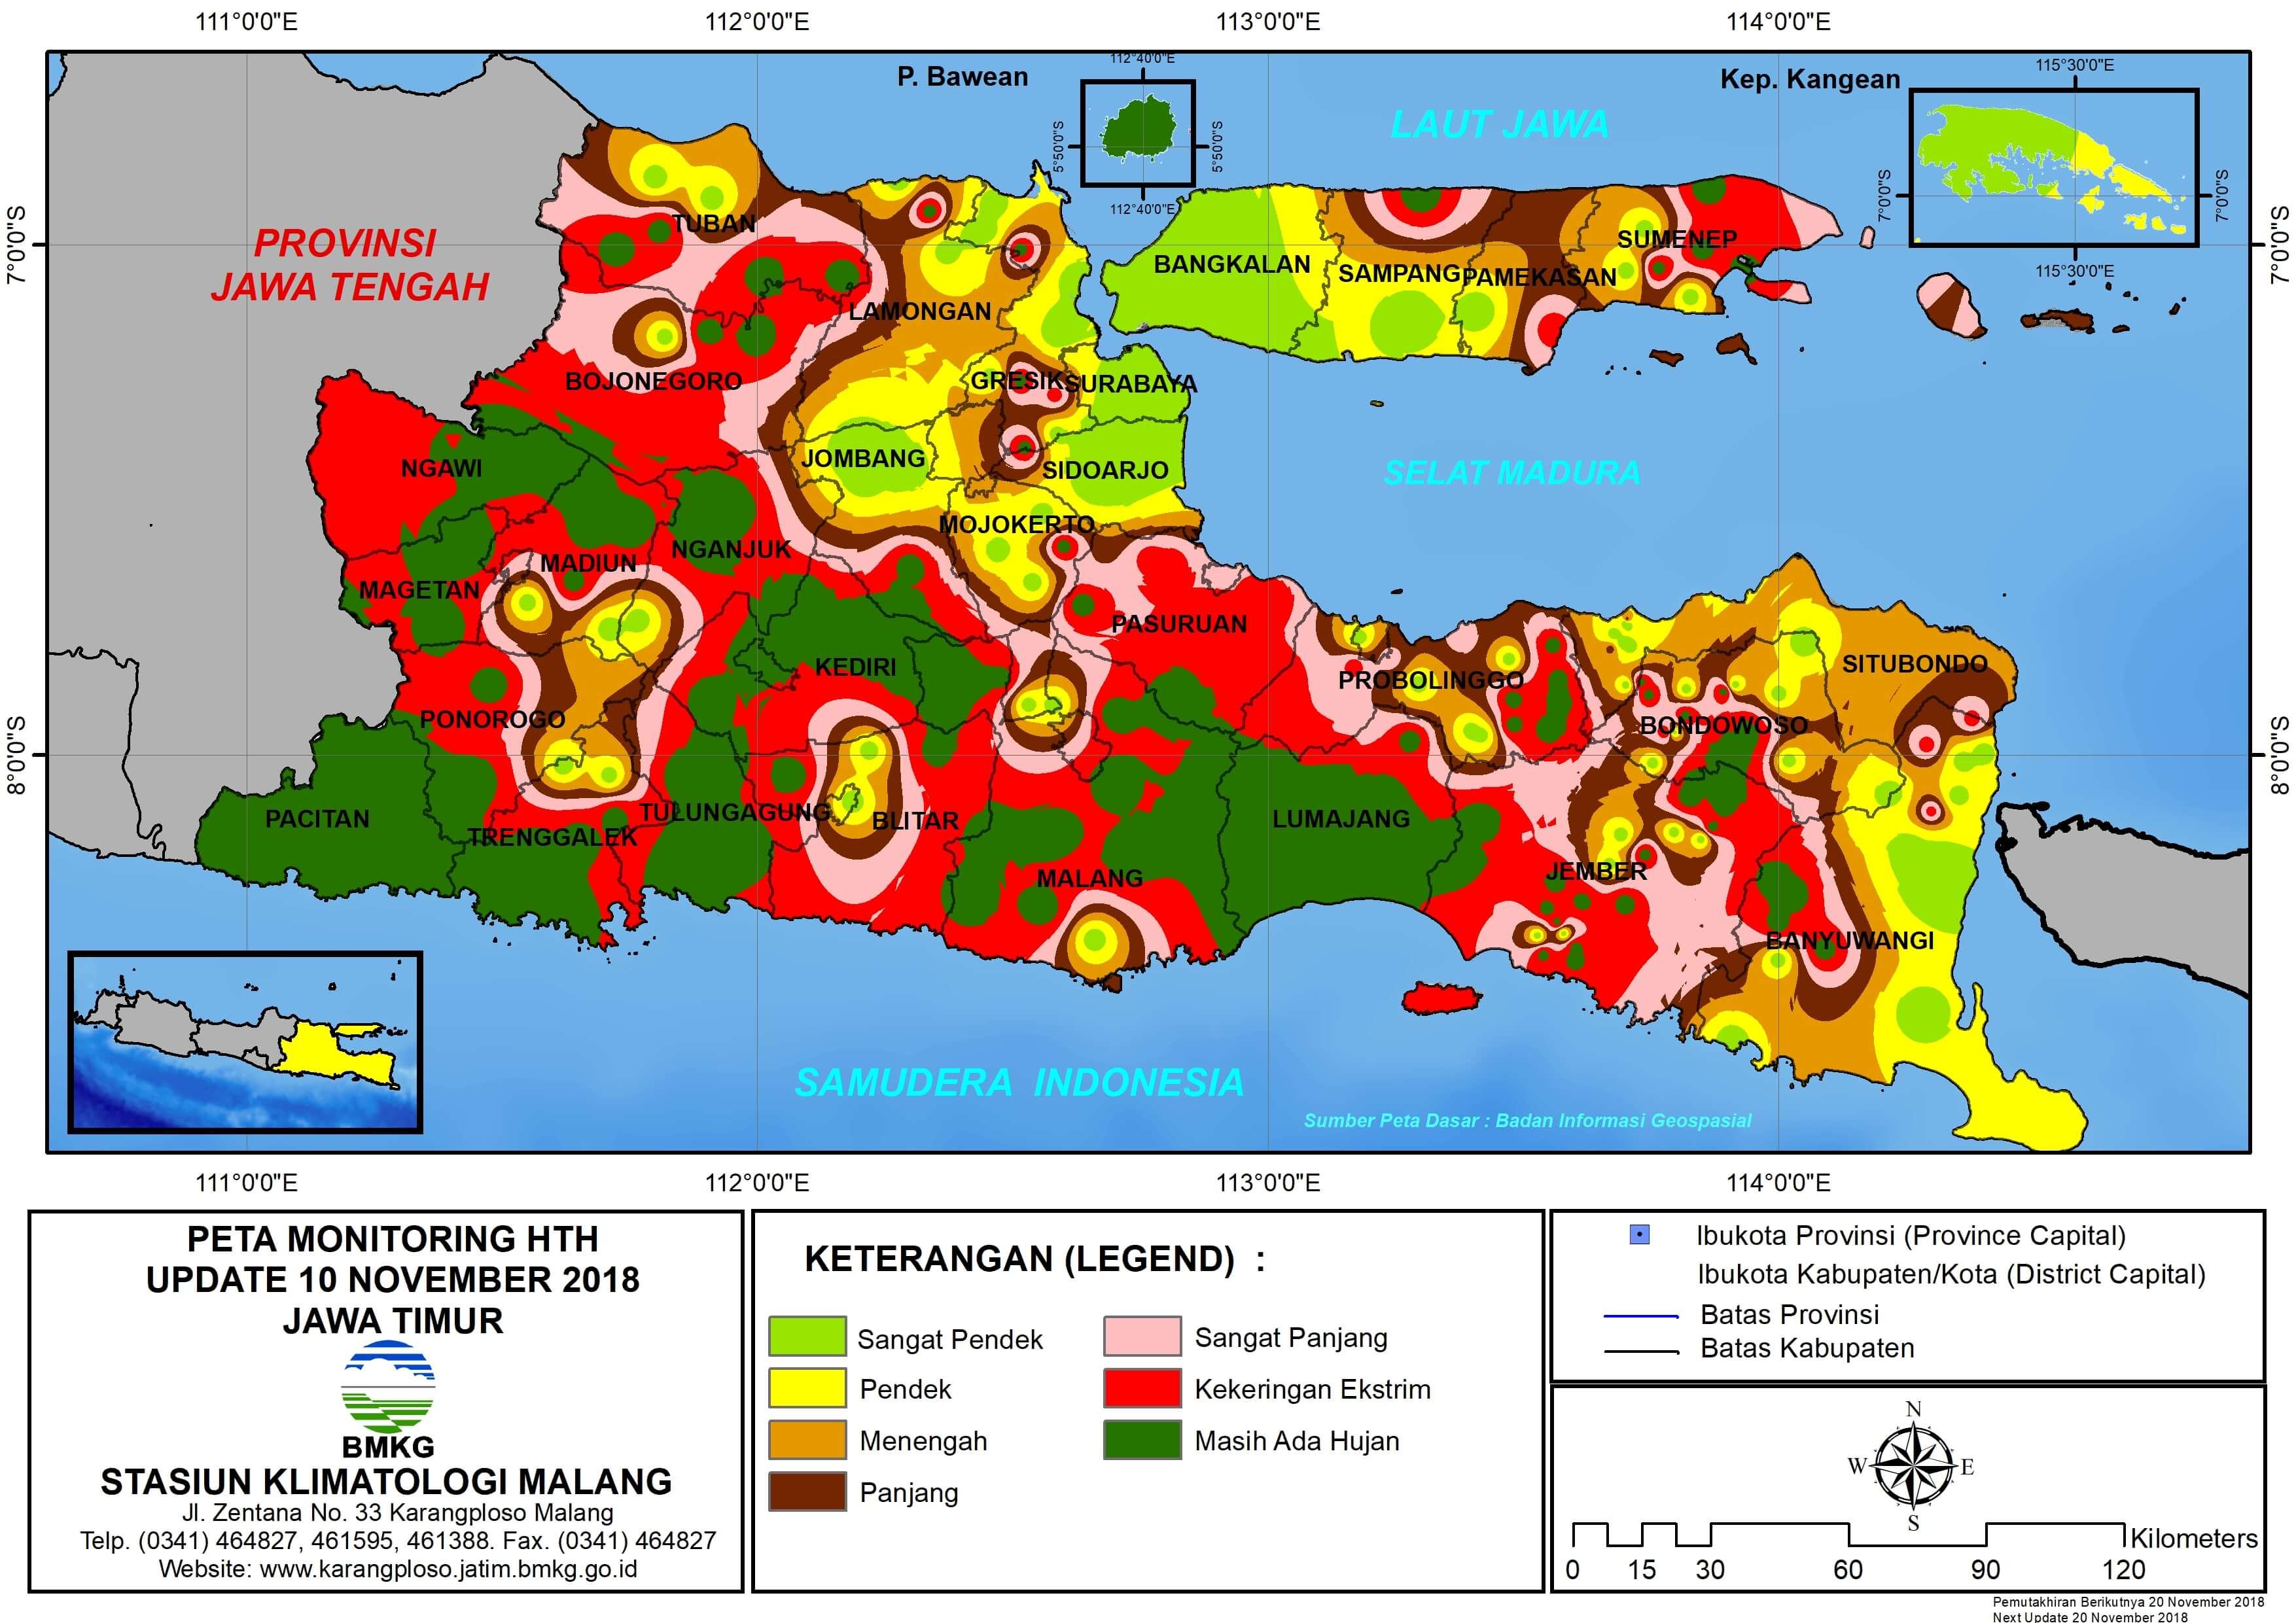 Monitoring Hari Tanpa Hujan Berturut-Turut Interpolasi Update 10 November 2018 di Provinsi Jawa Timur